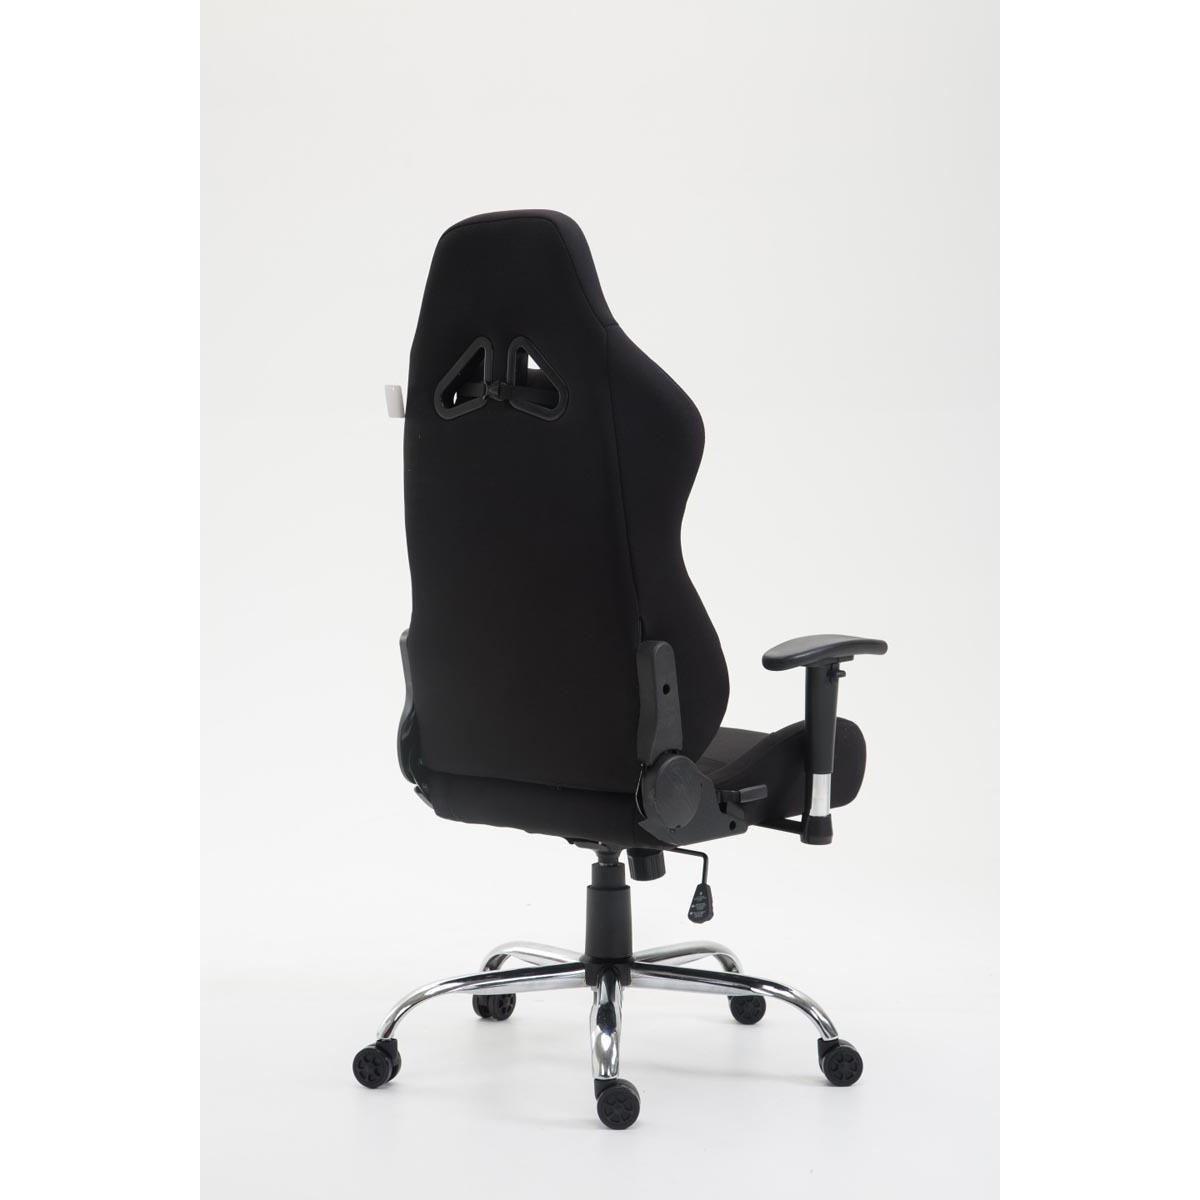 fauteuil gamer roby tissu design sportif et grand confort noir